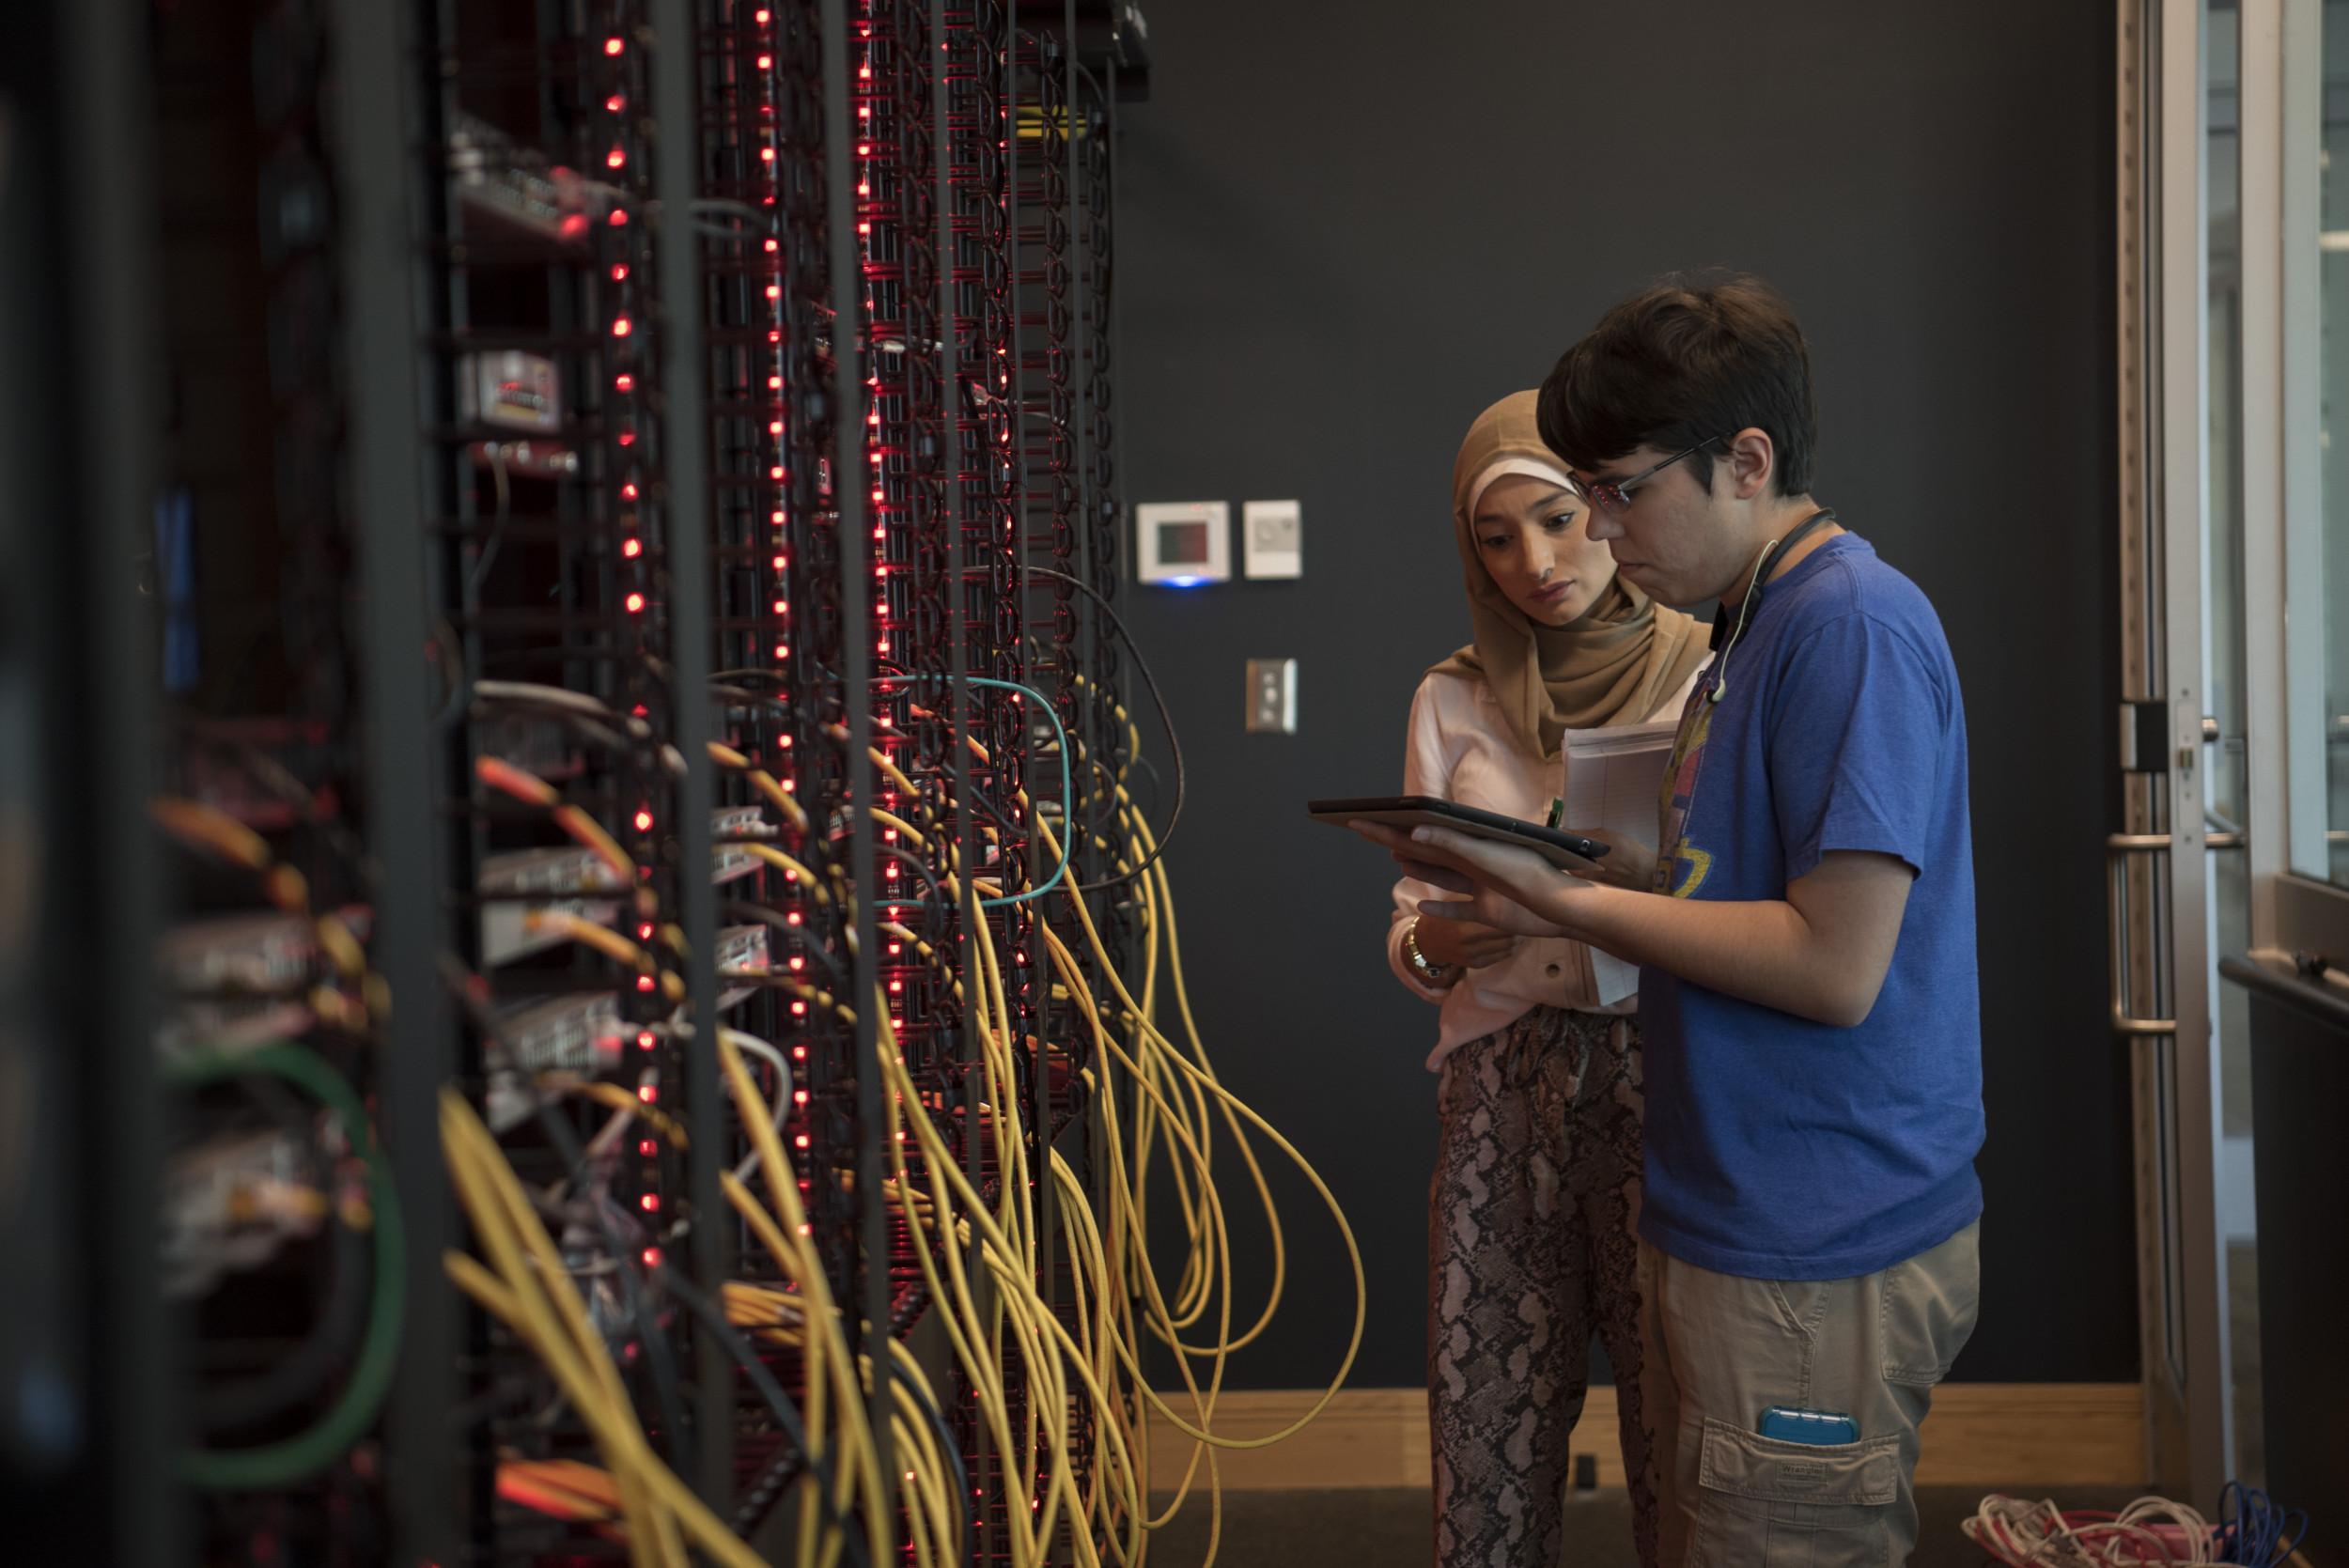 Northern Kentucky University College of Informatics